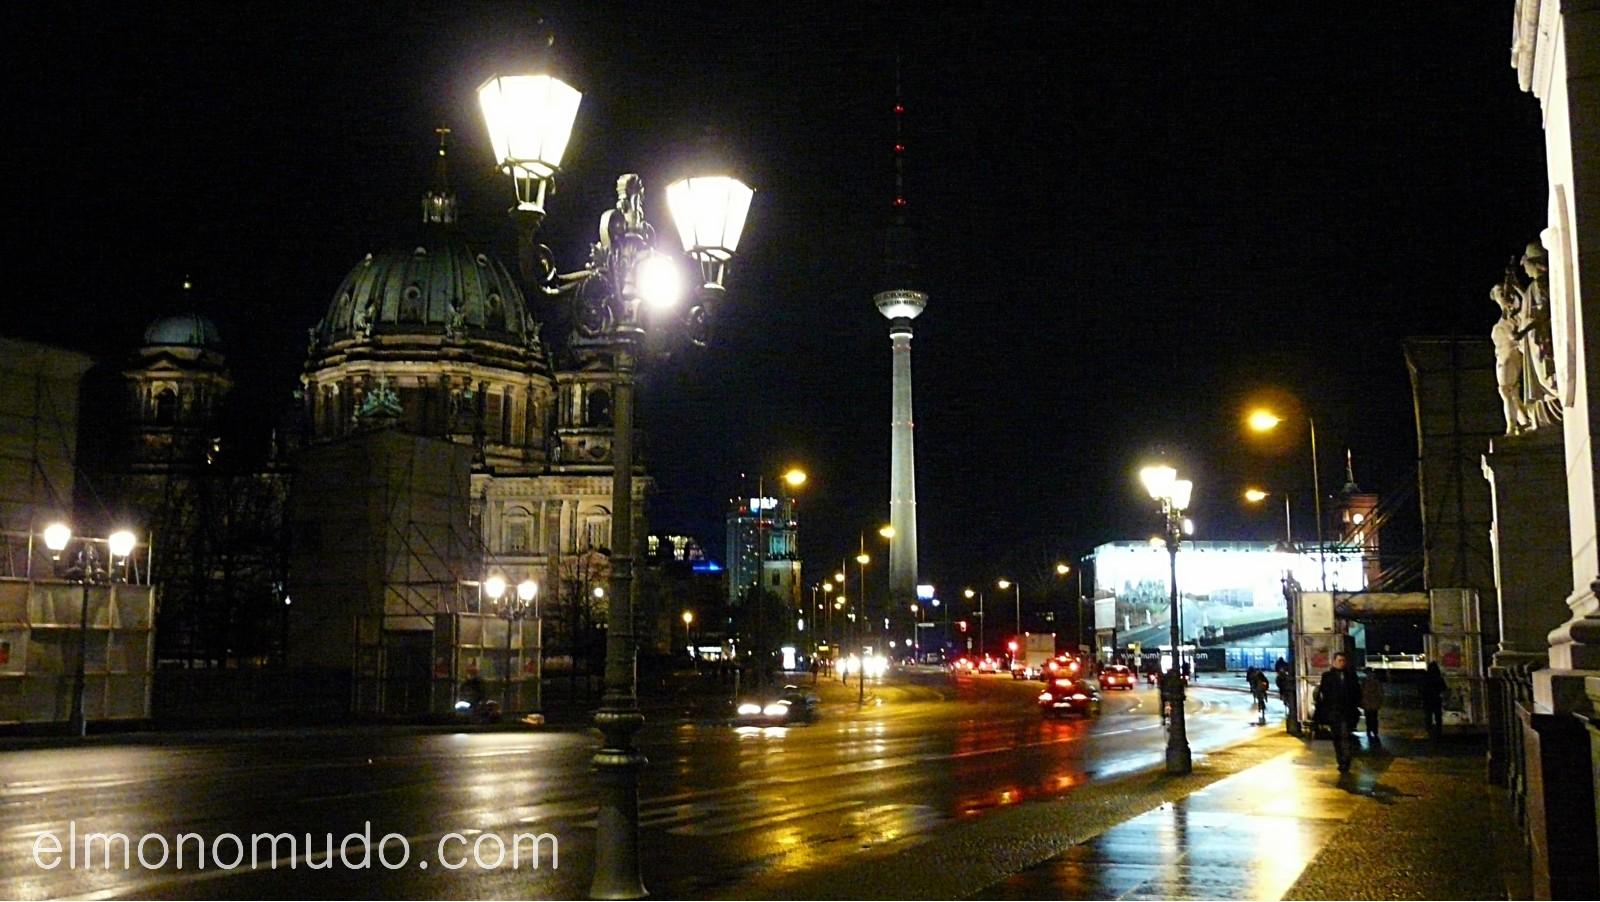 fernsehturm. torre de television al fondo, de noche. berlin